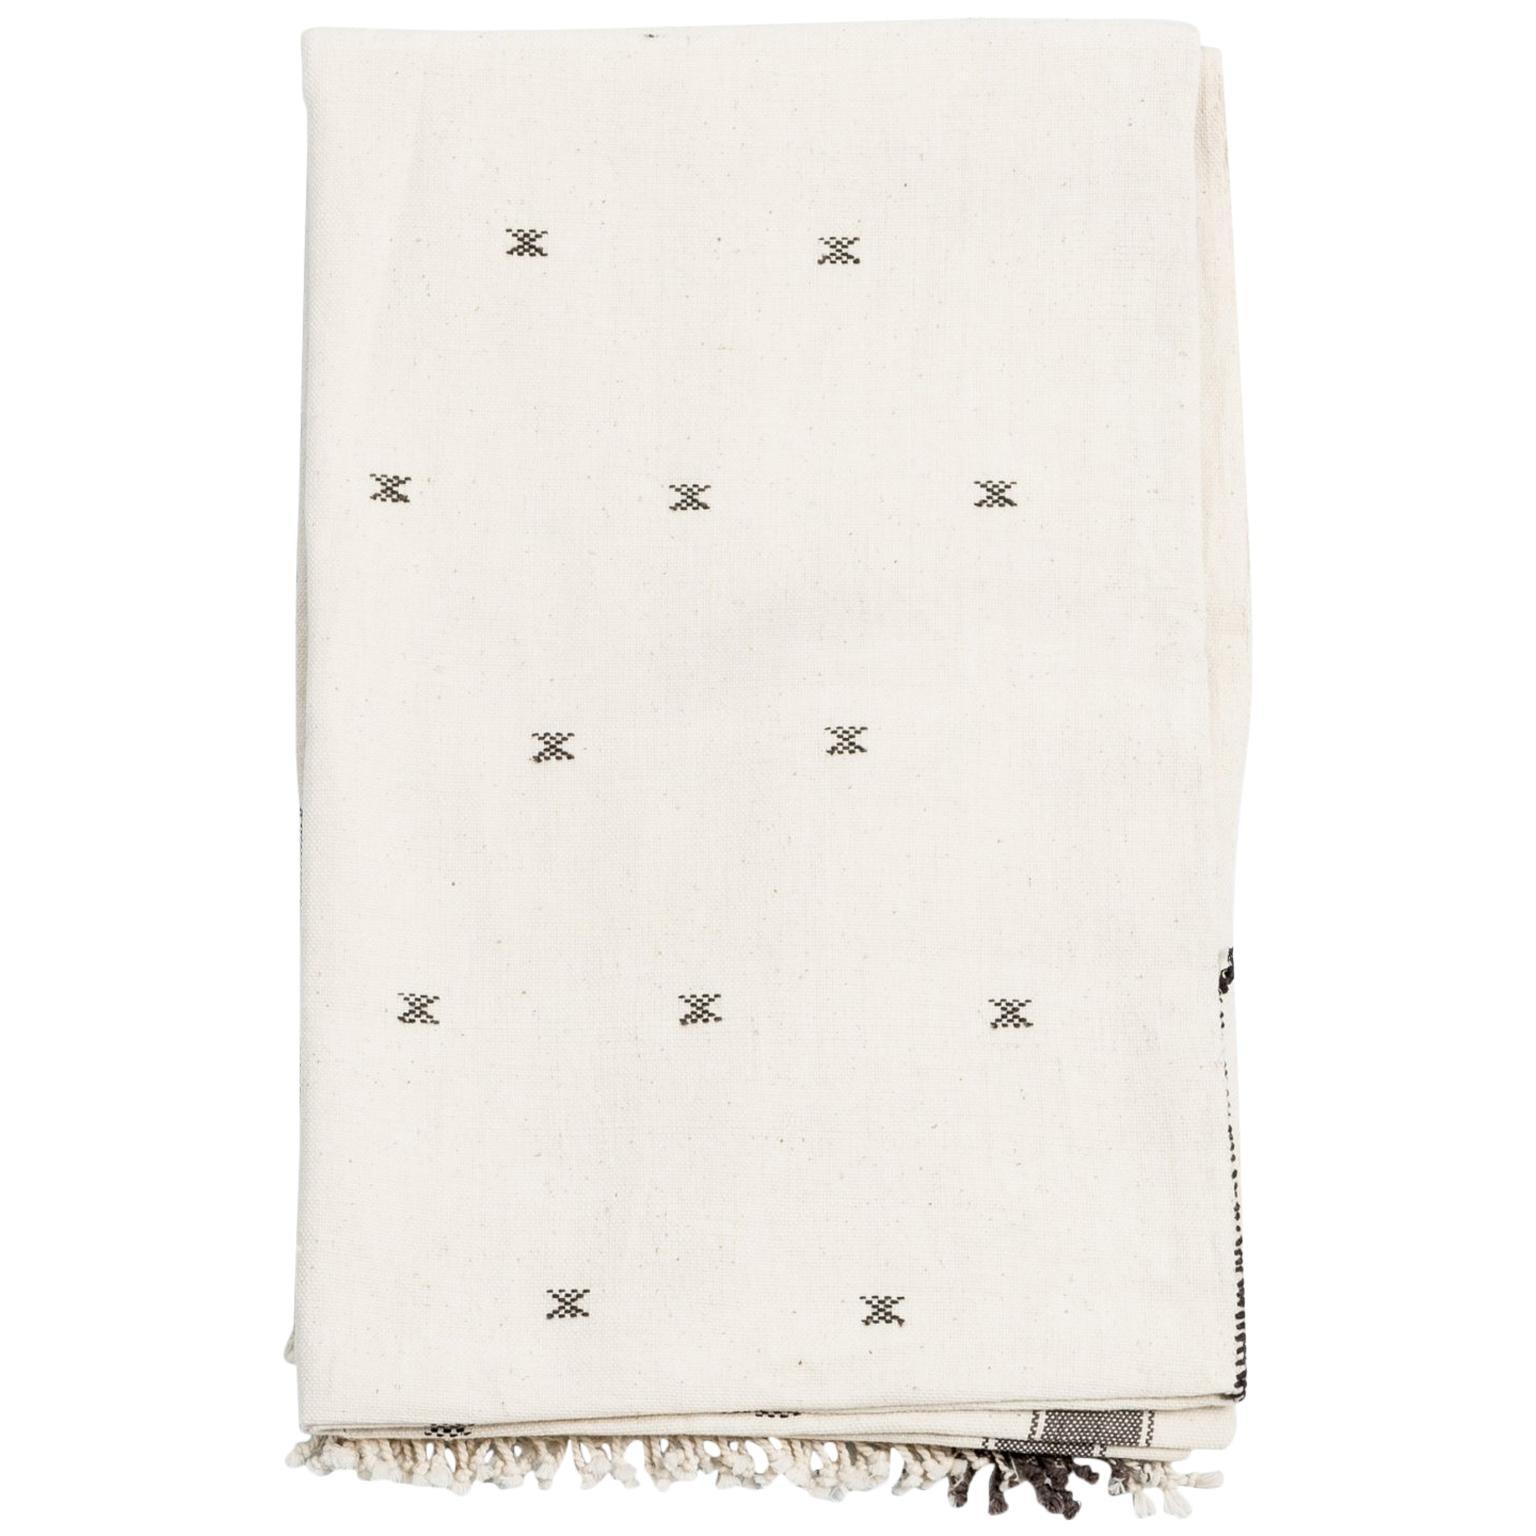 AMRO Handloom Throw / Blanket , Black & White Minimal Motifs  In Organic Cotton